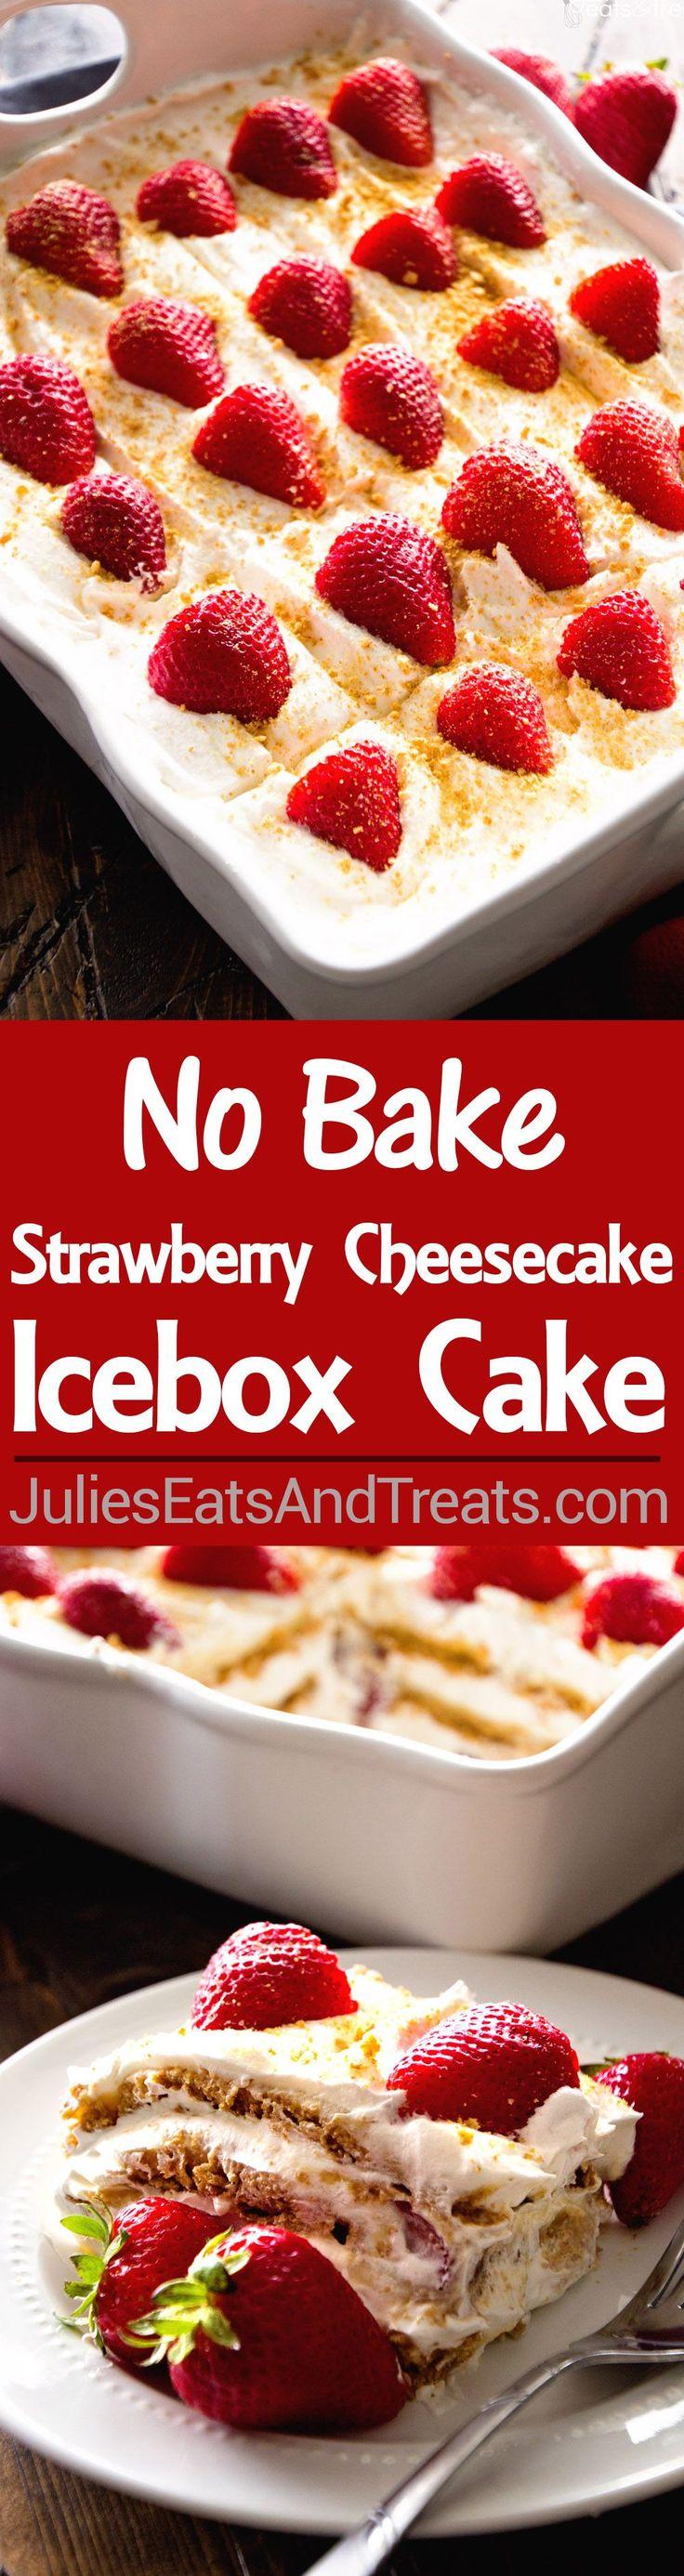 No Bake Strawberry Cheesecake Icebox Cake Recipe This Easy No Bake Dessert has